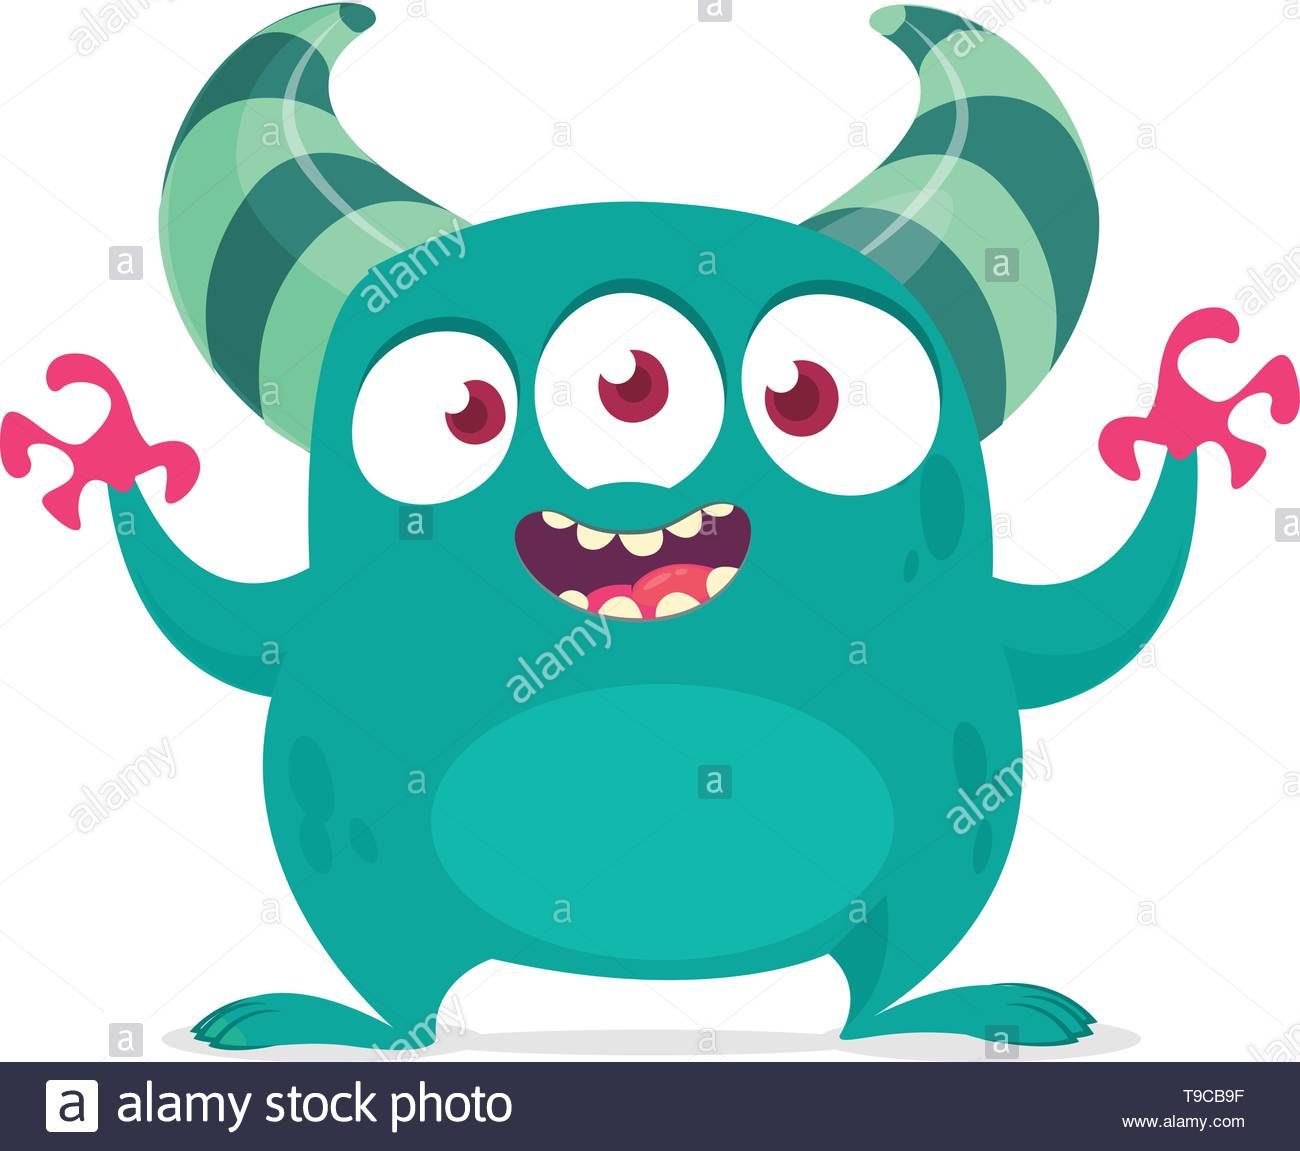 Funny cartoon alien with three eyes. Vector illustration. Clipart.